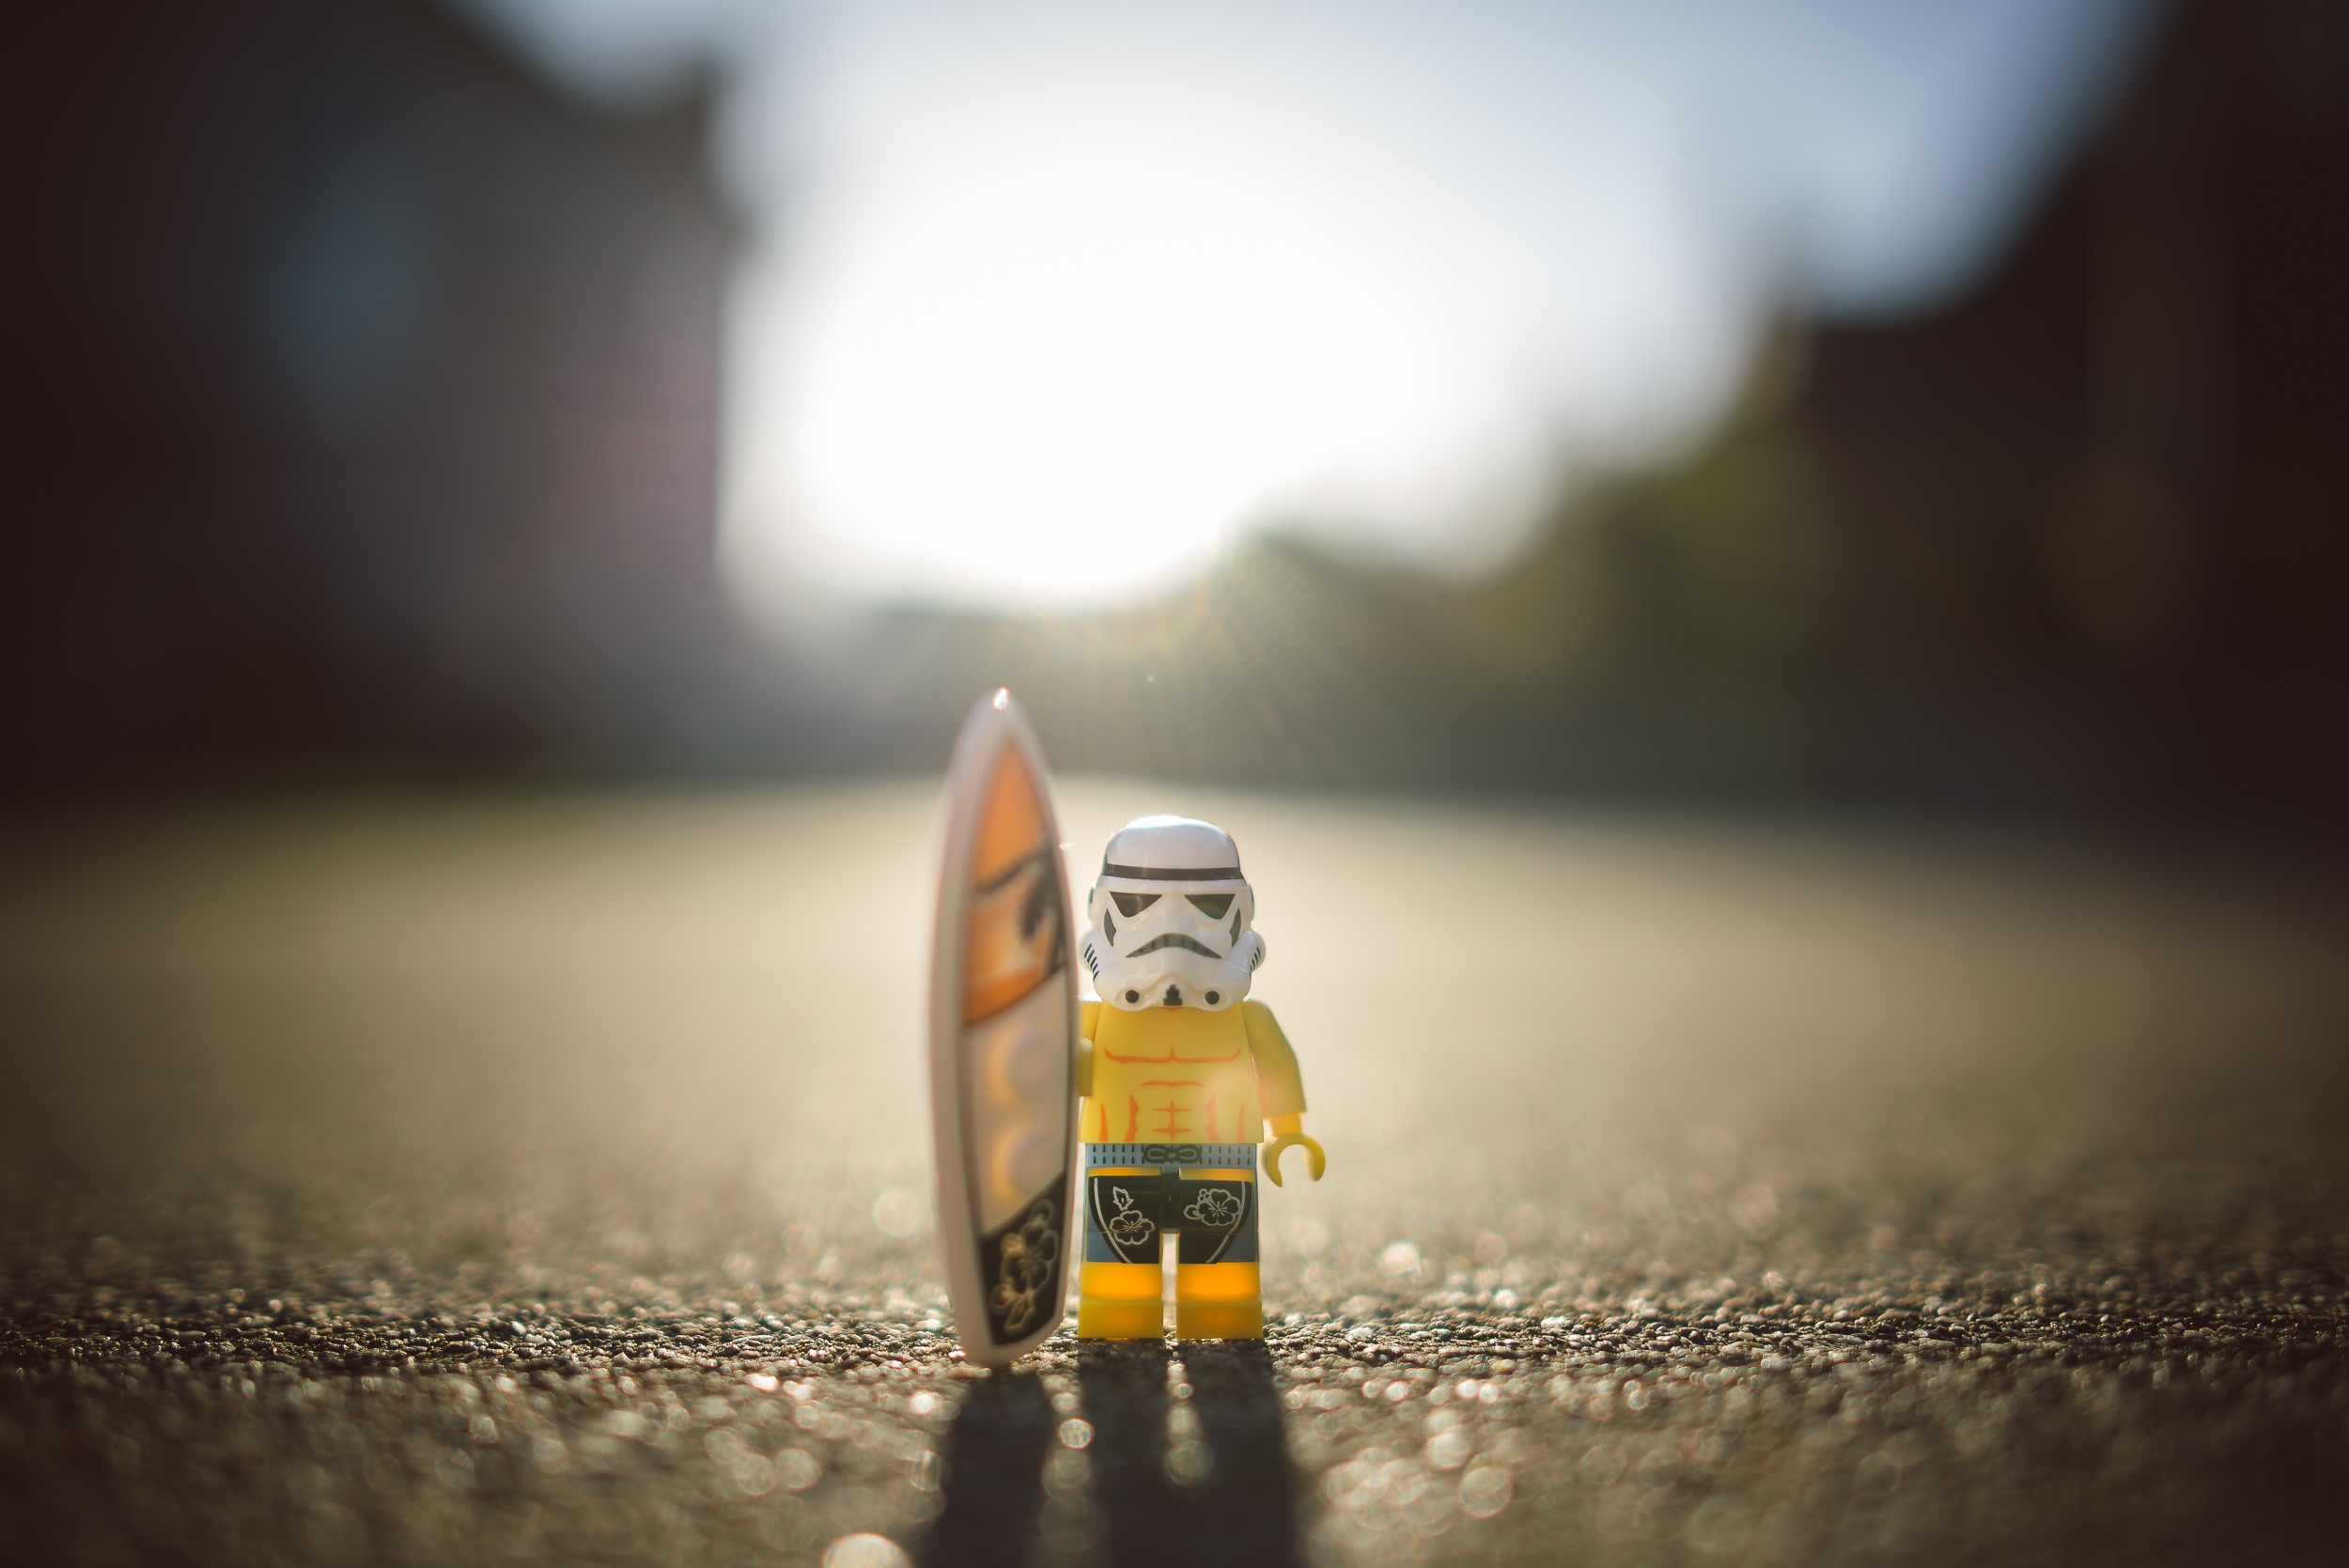 Lego-Portrait-Series-Reggie-Ballesteros-0012.jpg